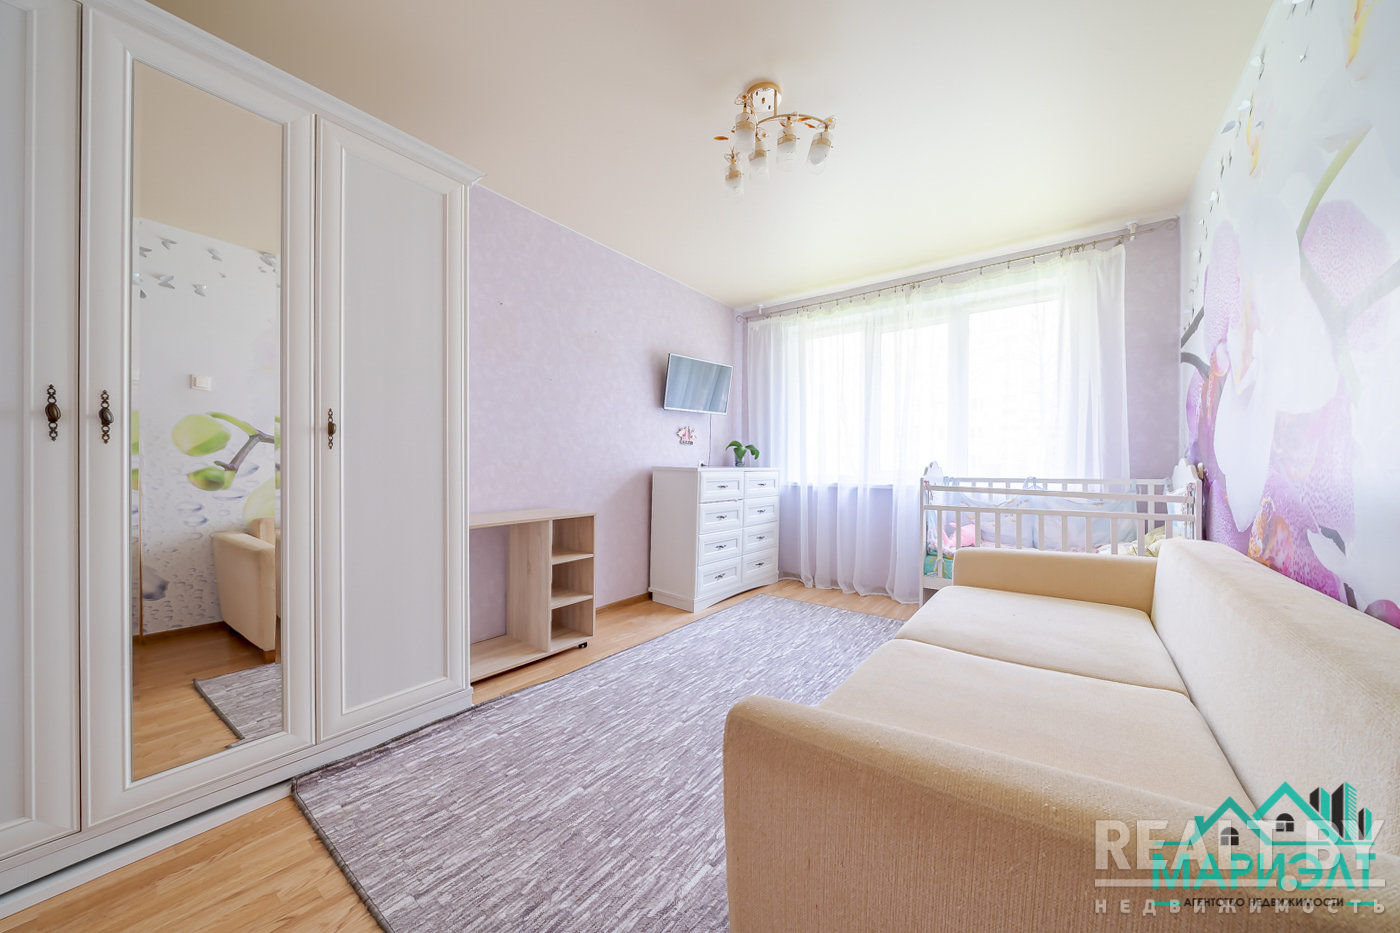 Уютная двухкомнатная квартира в зеленом районе Минска